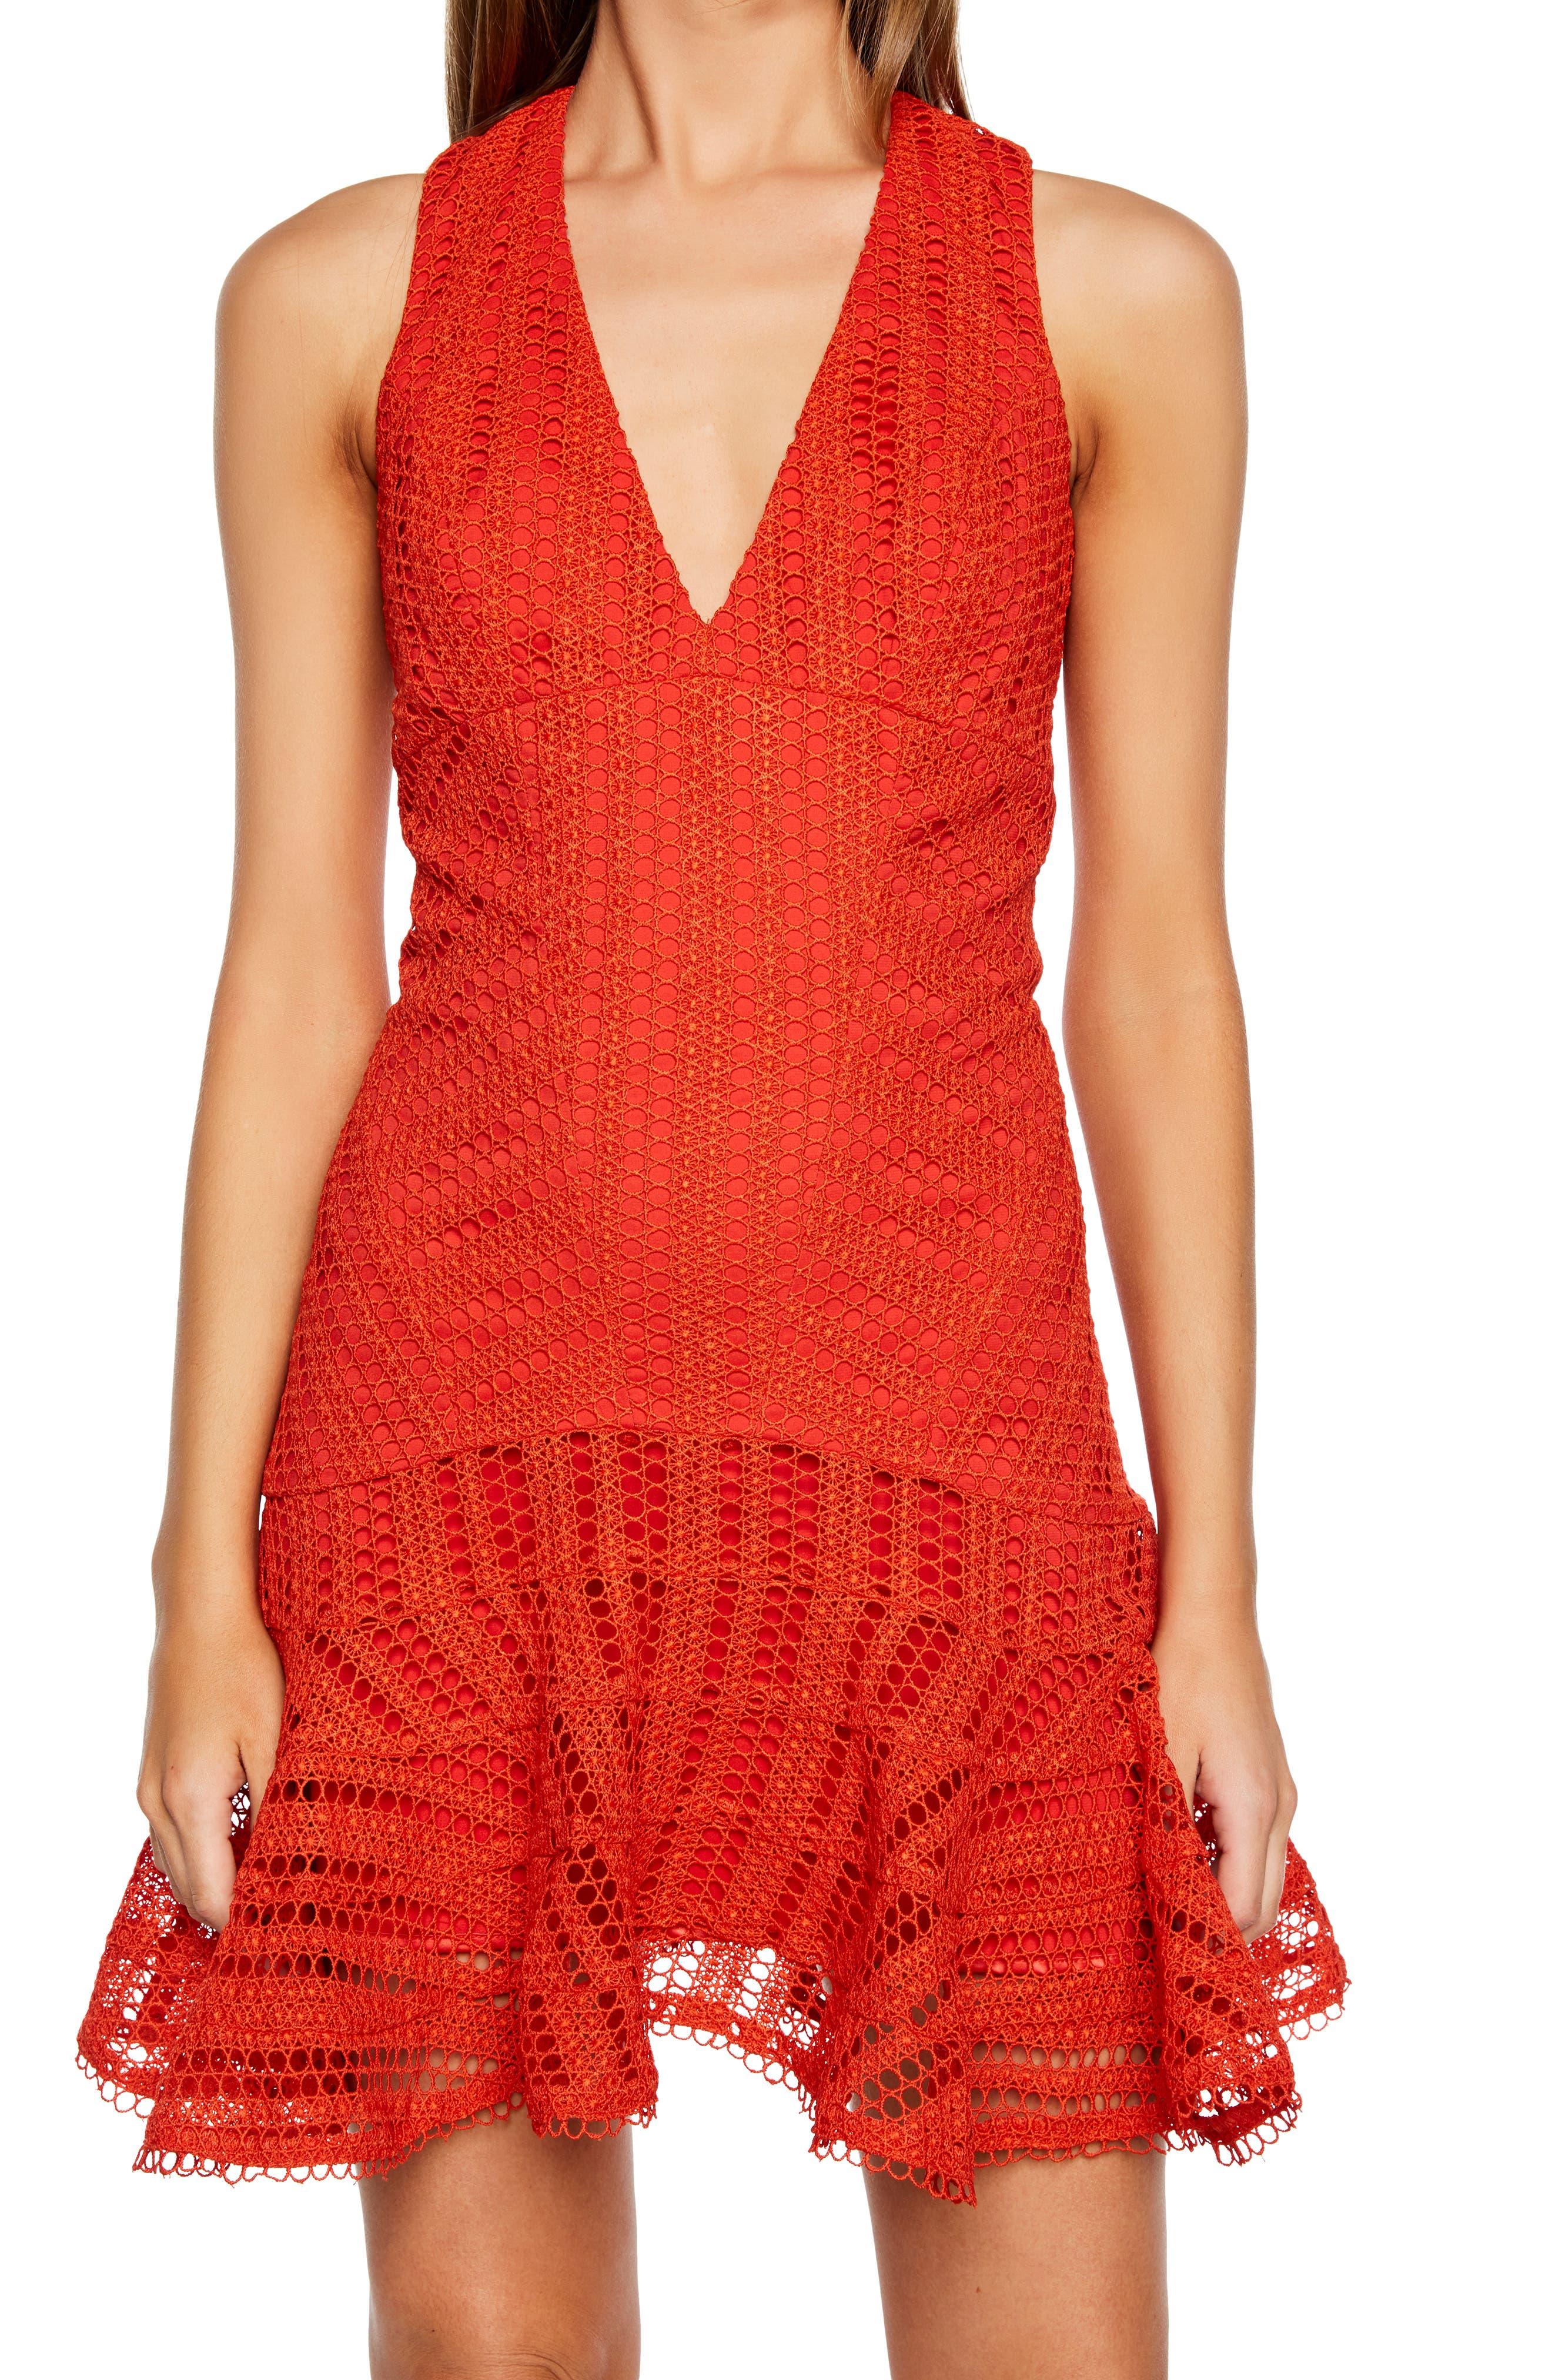 BARDOT,                             Fiesta Lace Cocktail Dress,                             Alternate thumbnail 4, color,                             FIESTA ORANGE